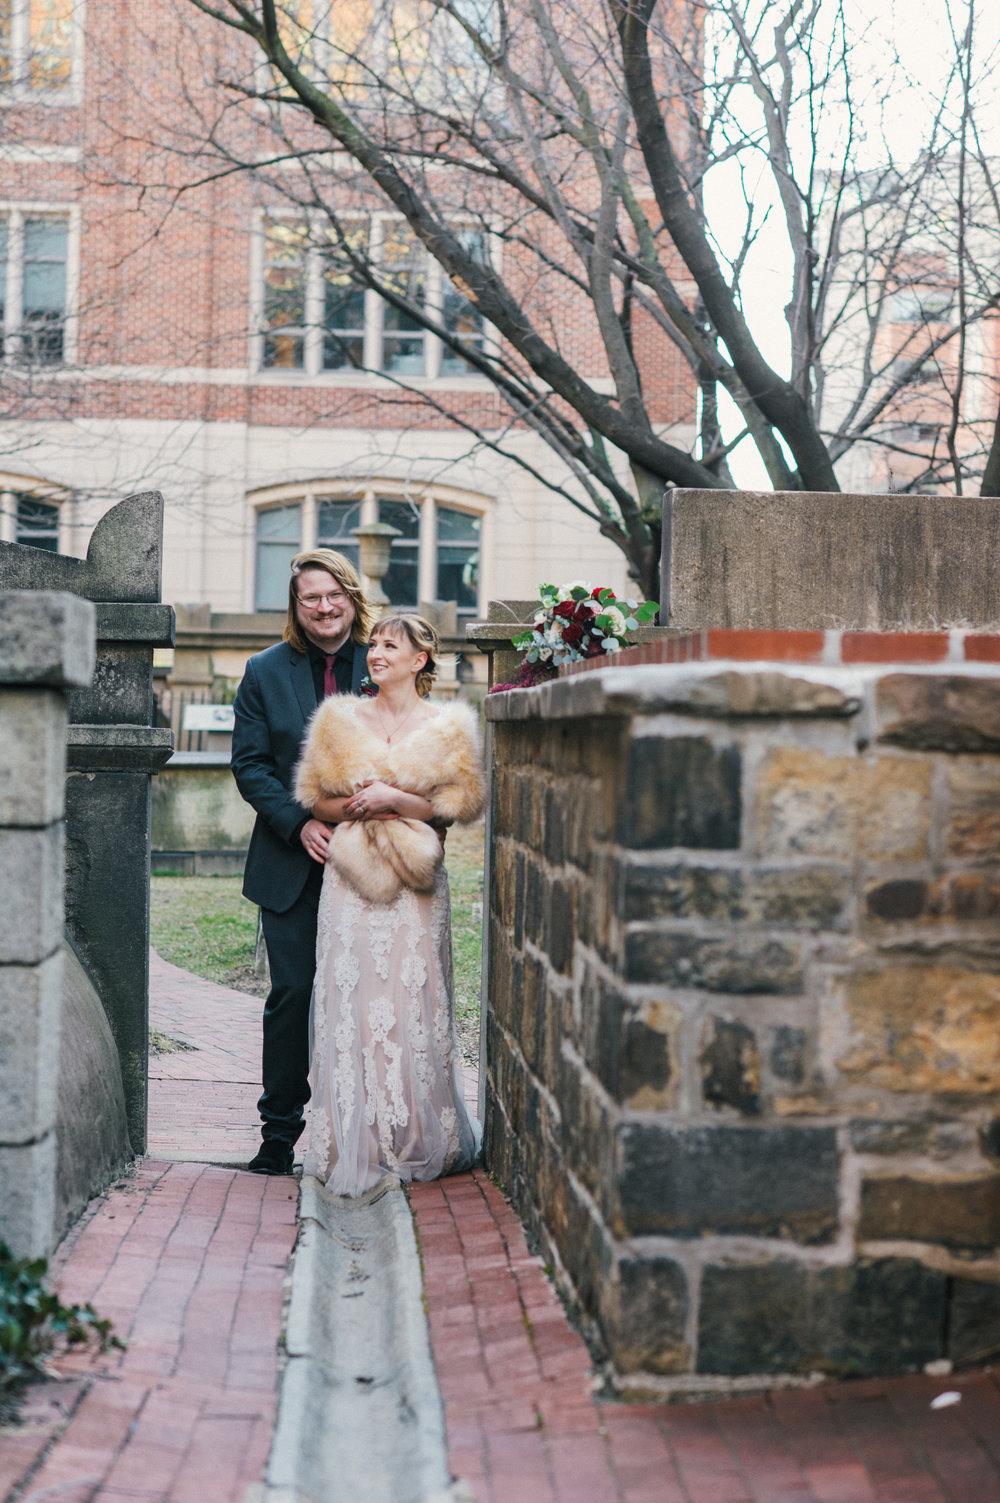 Amber and Kyles Wedding 33.jpg